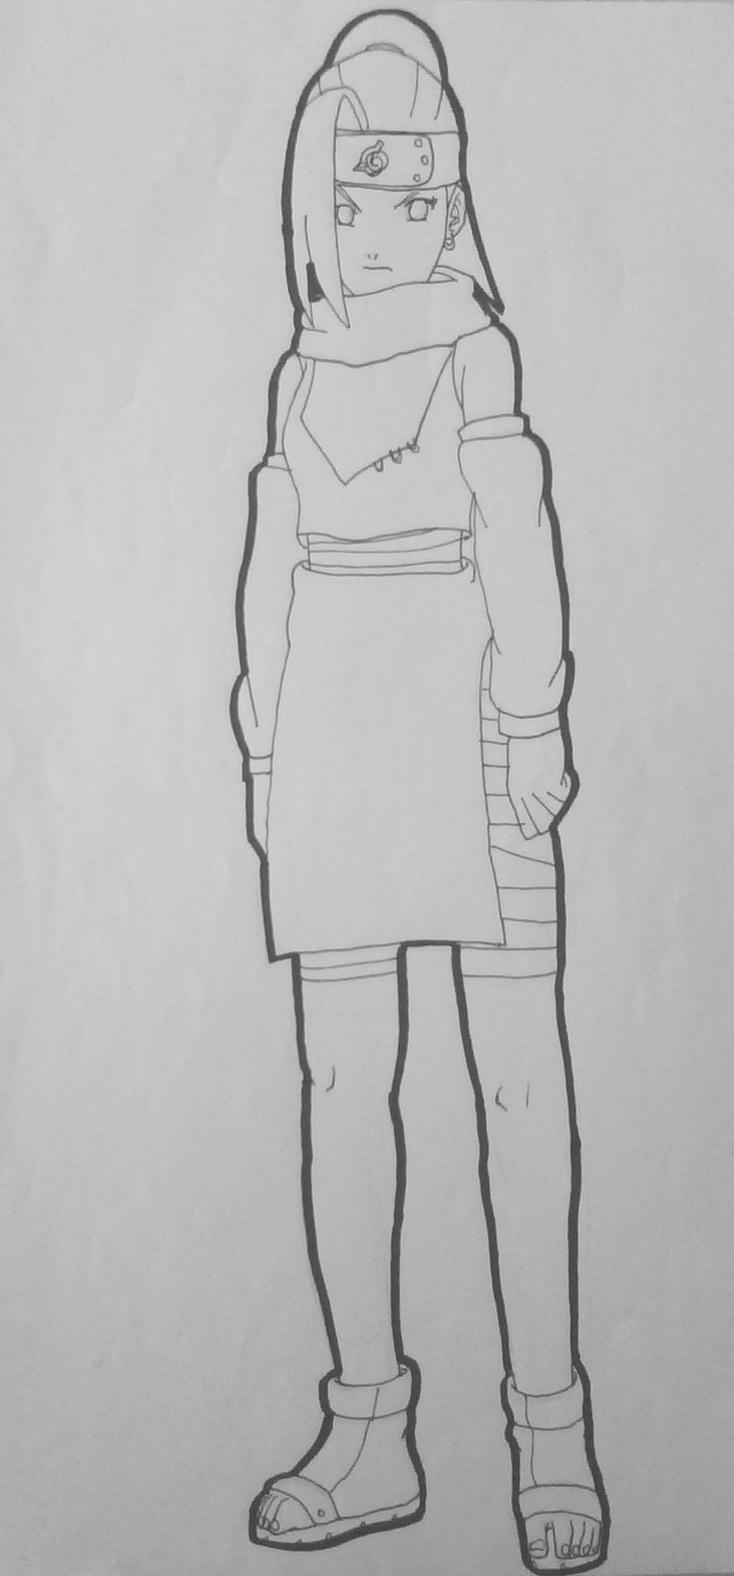 Drawn naruto ino Lineart DeviantArt _PTS_ Yamanaka Lineart